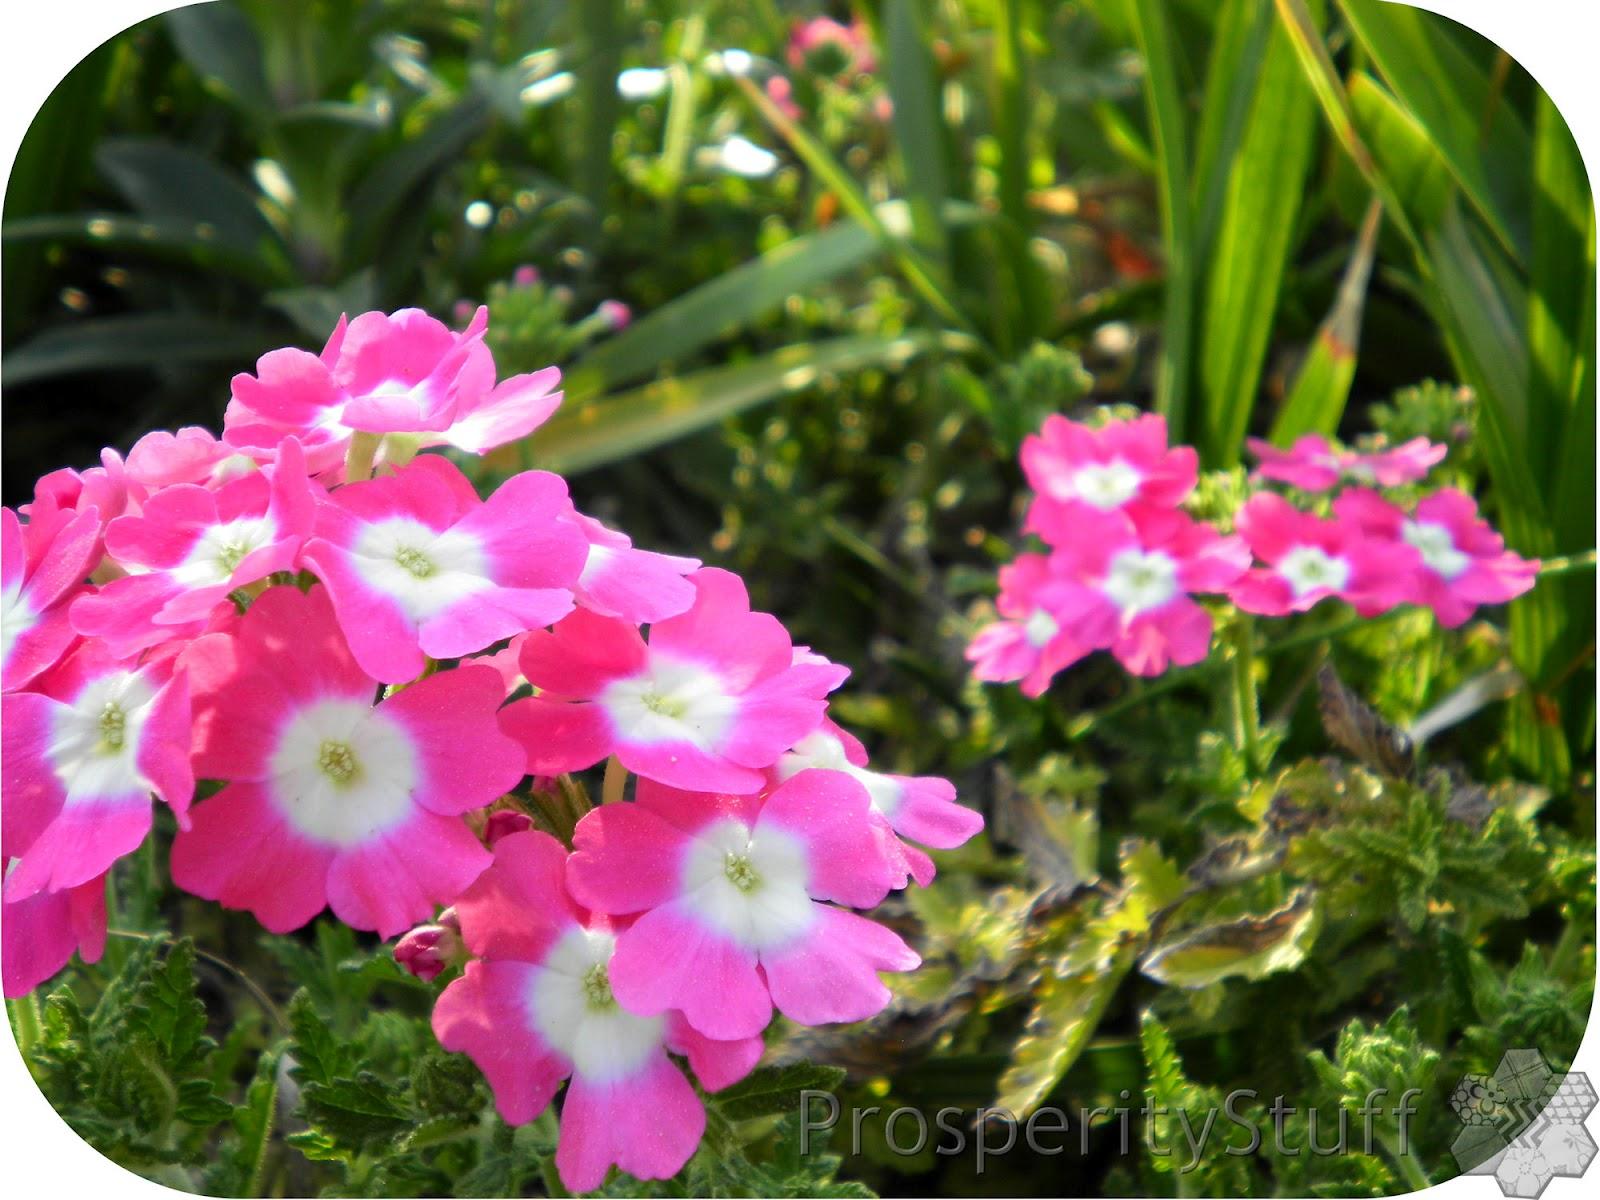 Pink Perennial Flowers